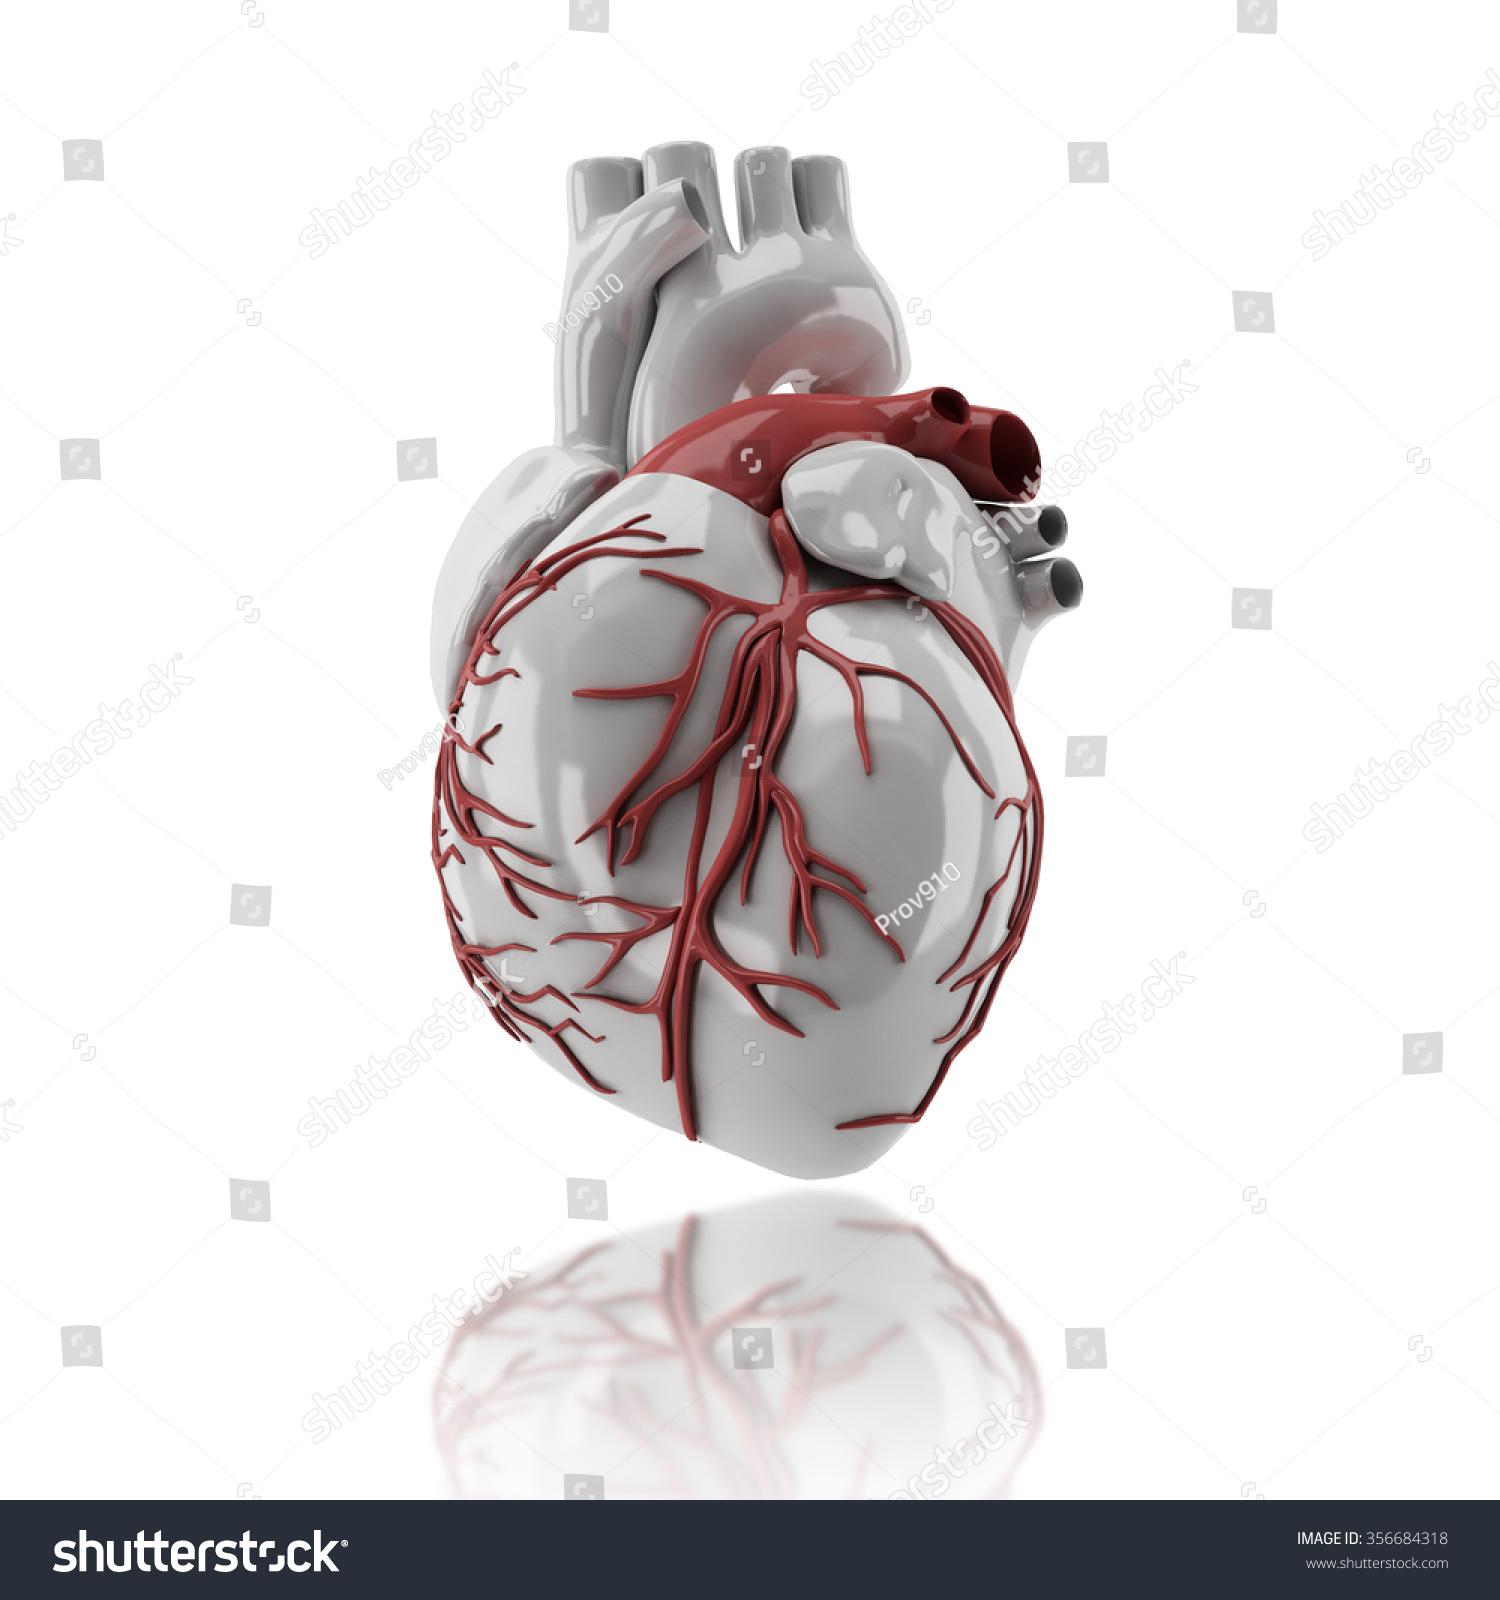 Human Heart Anatomy 3 D Render Image Stock Illustration 356684318 ...